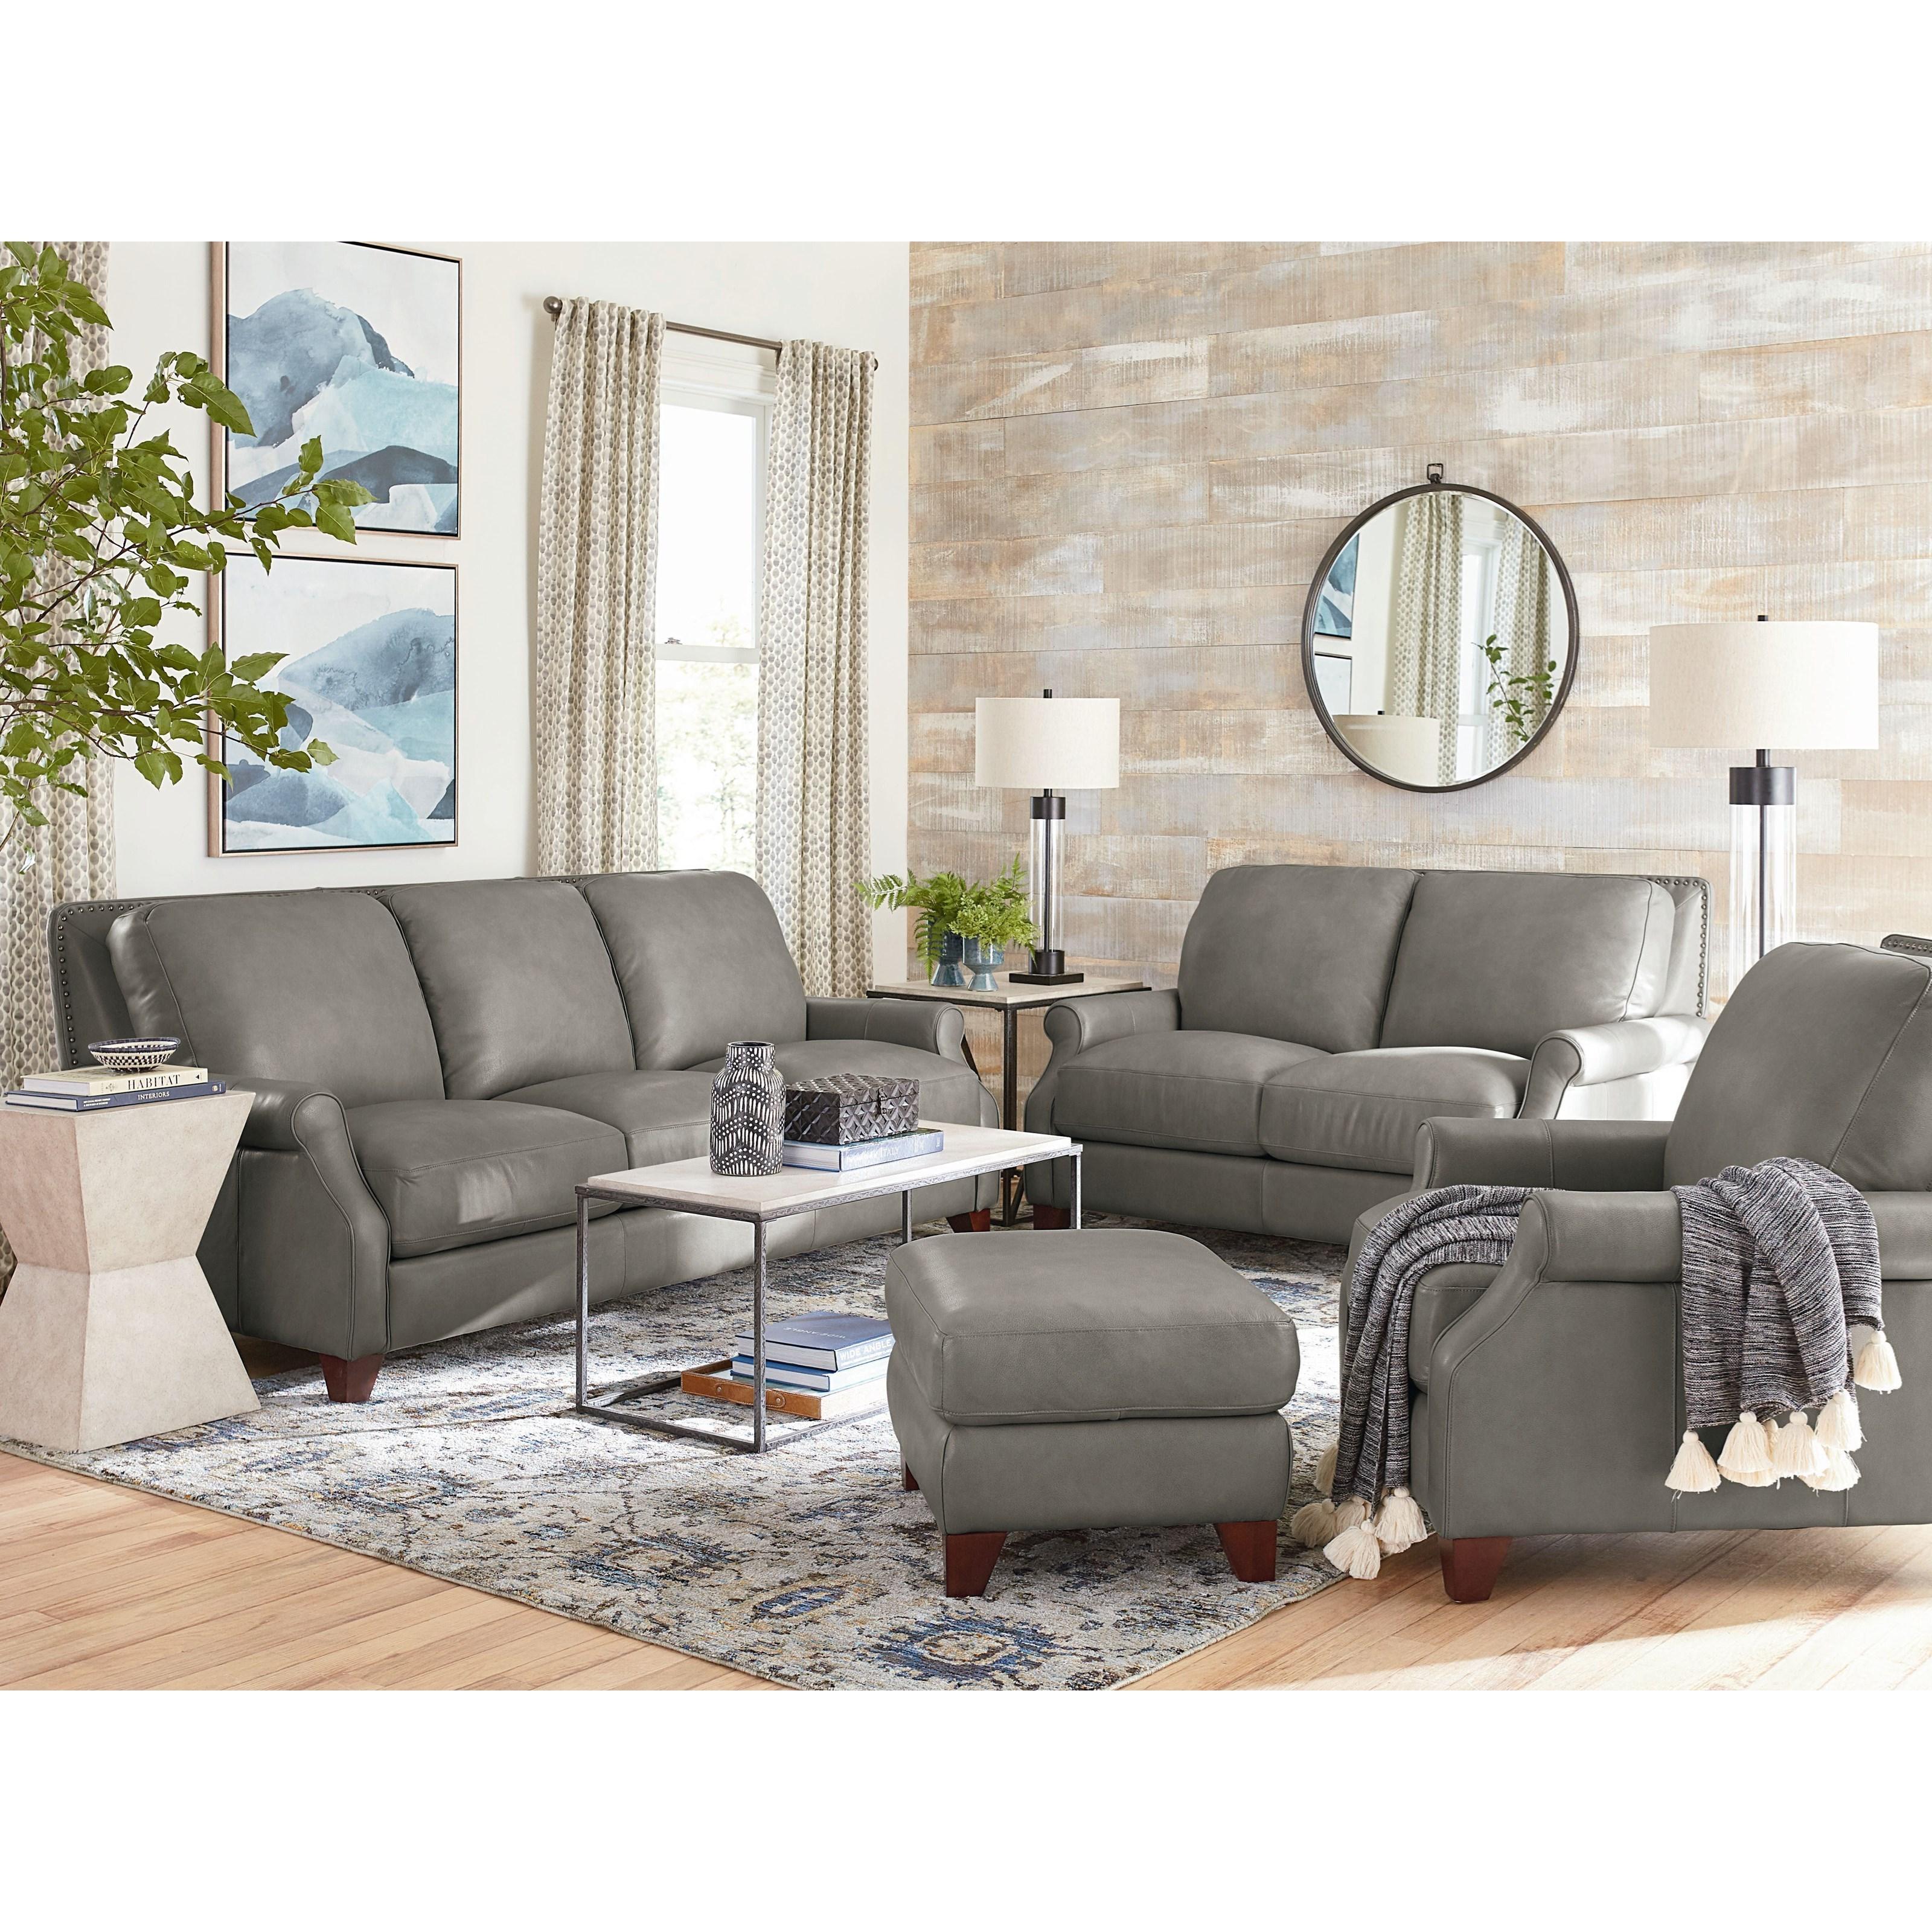 Greyson Living Room Group Bassett Greyson by Bassett at Crowley Furniture & Mattress